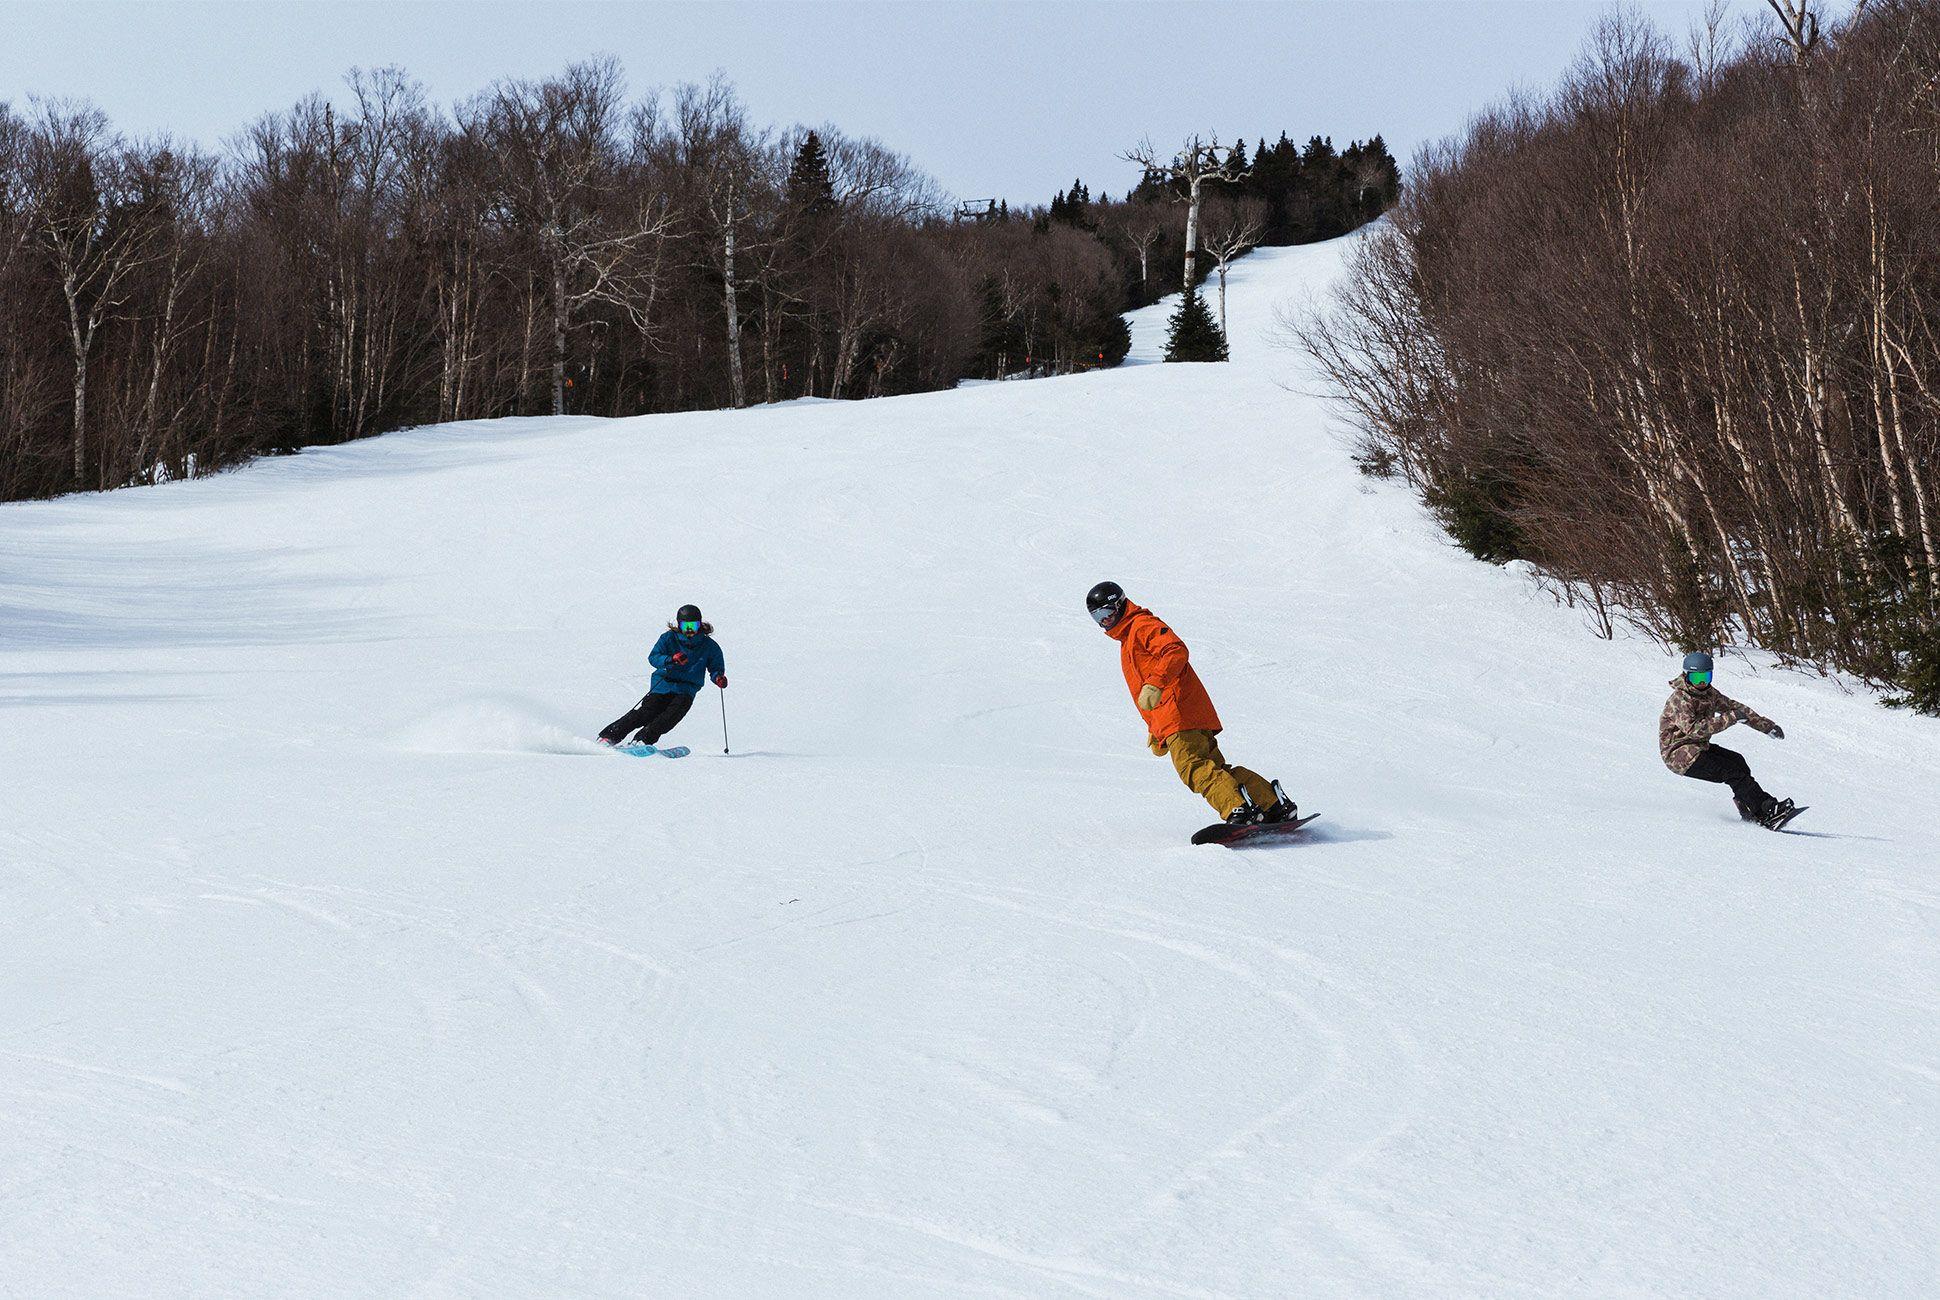 ultimate-ski-and-snow-gear-patrol-dakine-slide-5